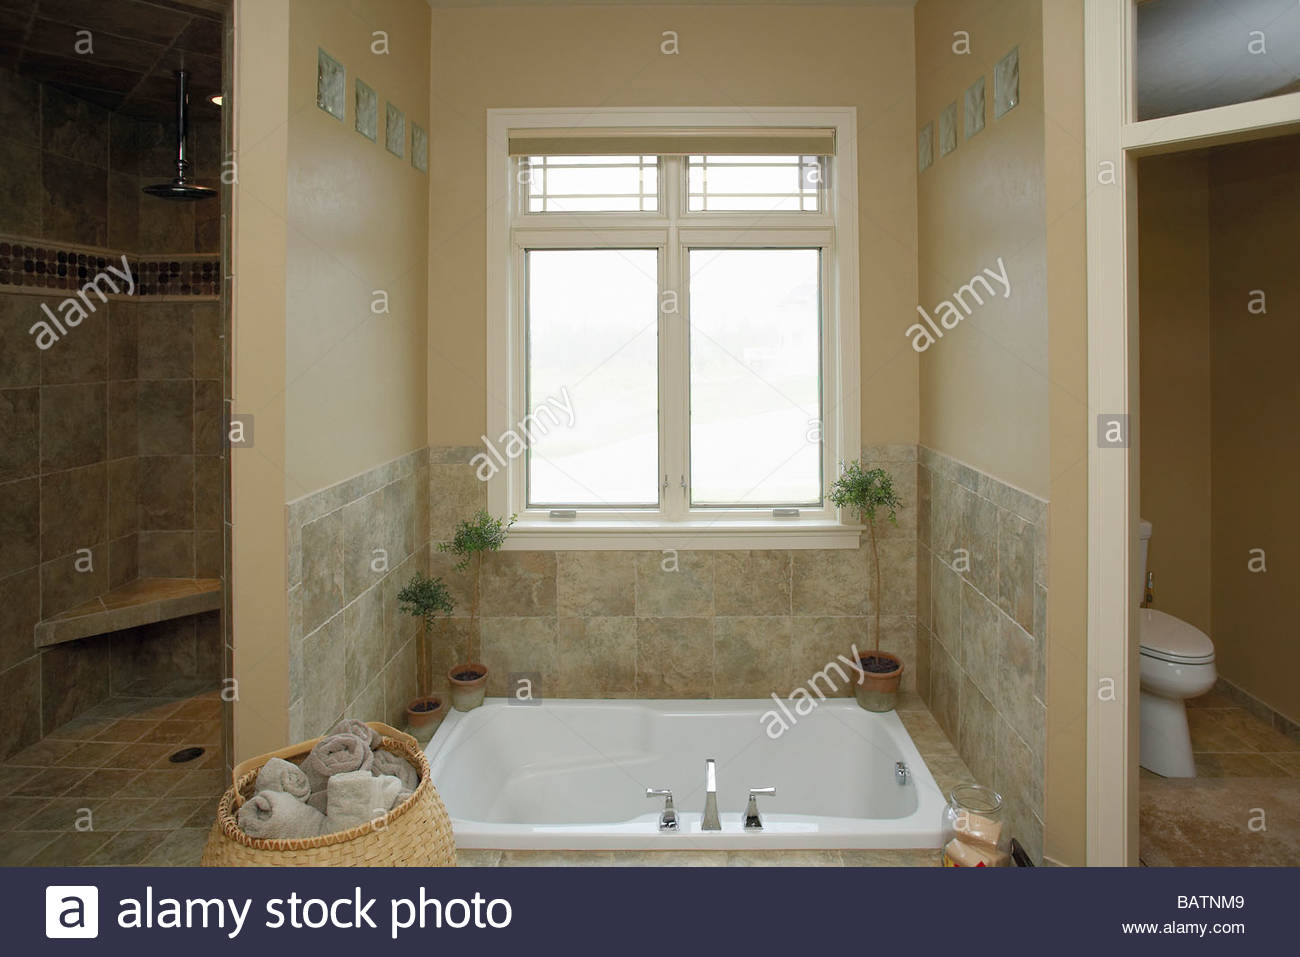 Marmorbad Mit Versenkte Badewanne Stockfoto Bild 23900809 Alamy